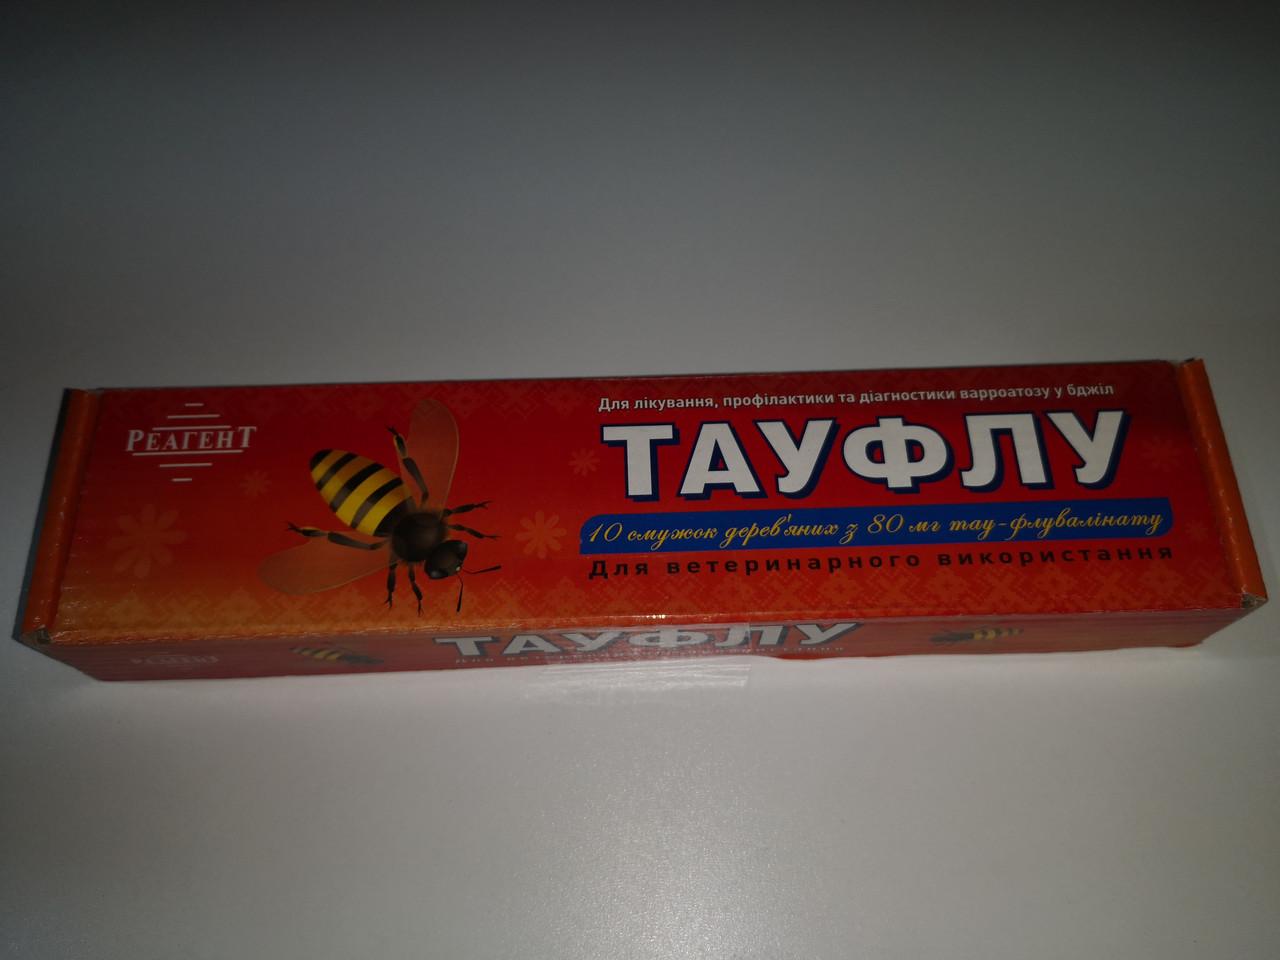 Тауфлу (10 полосок)